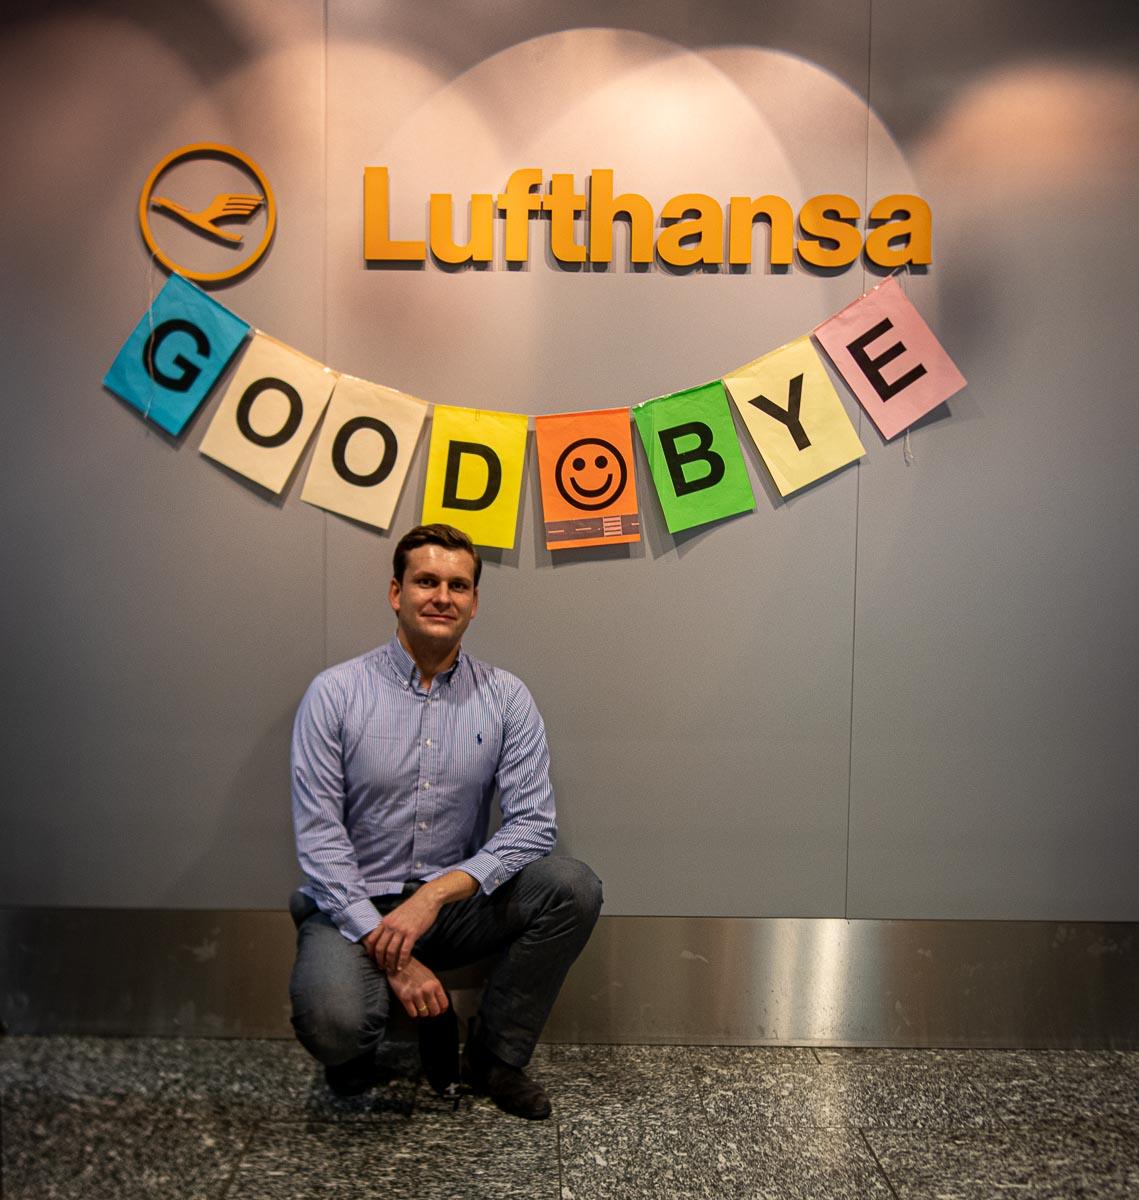 Lufthansa Lounge Flughafen Berlin Tegel TXL